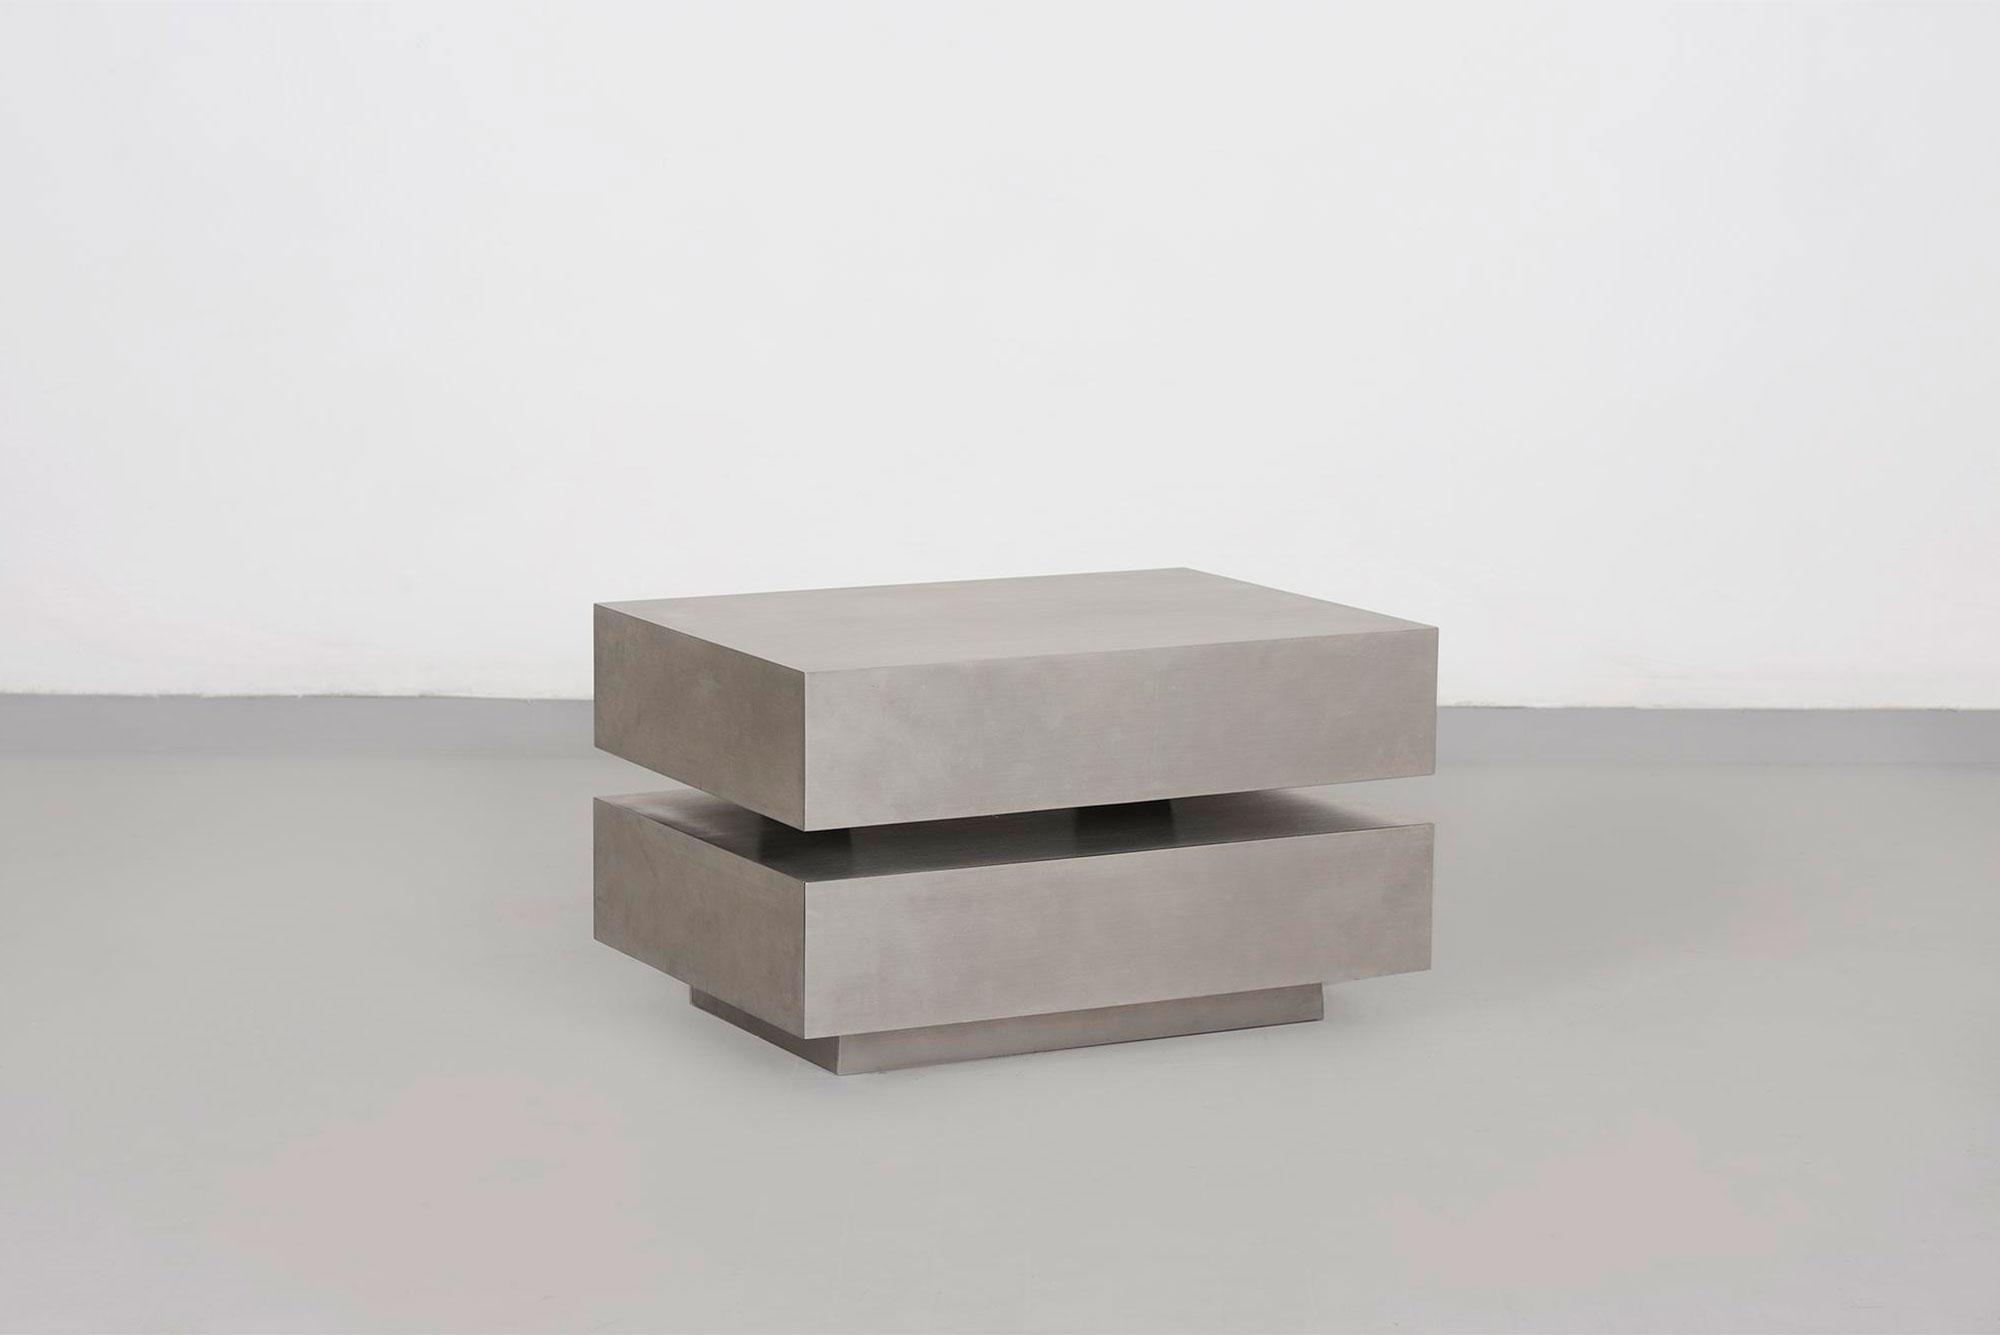 Gabriella Crespi                                 Scultura low table